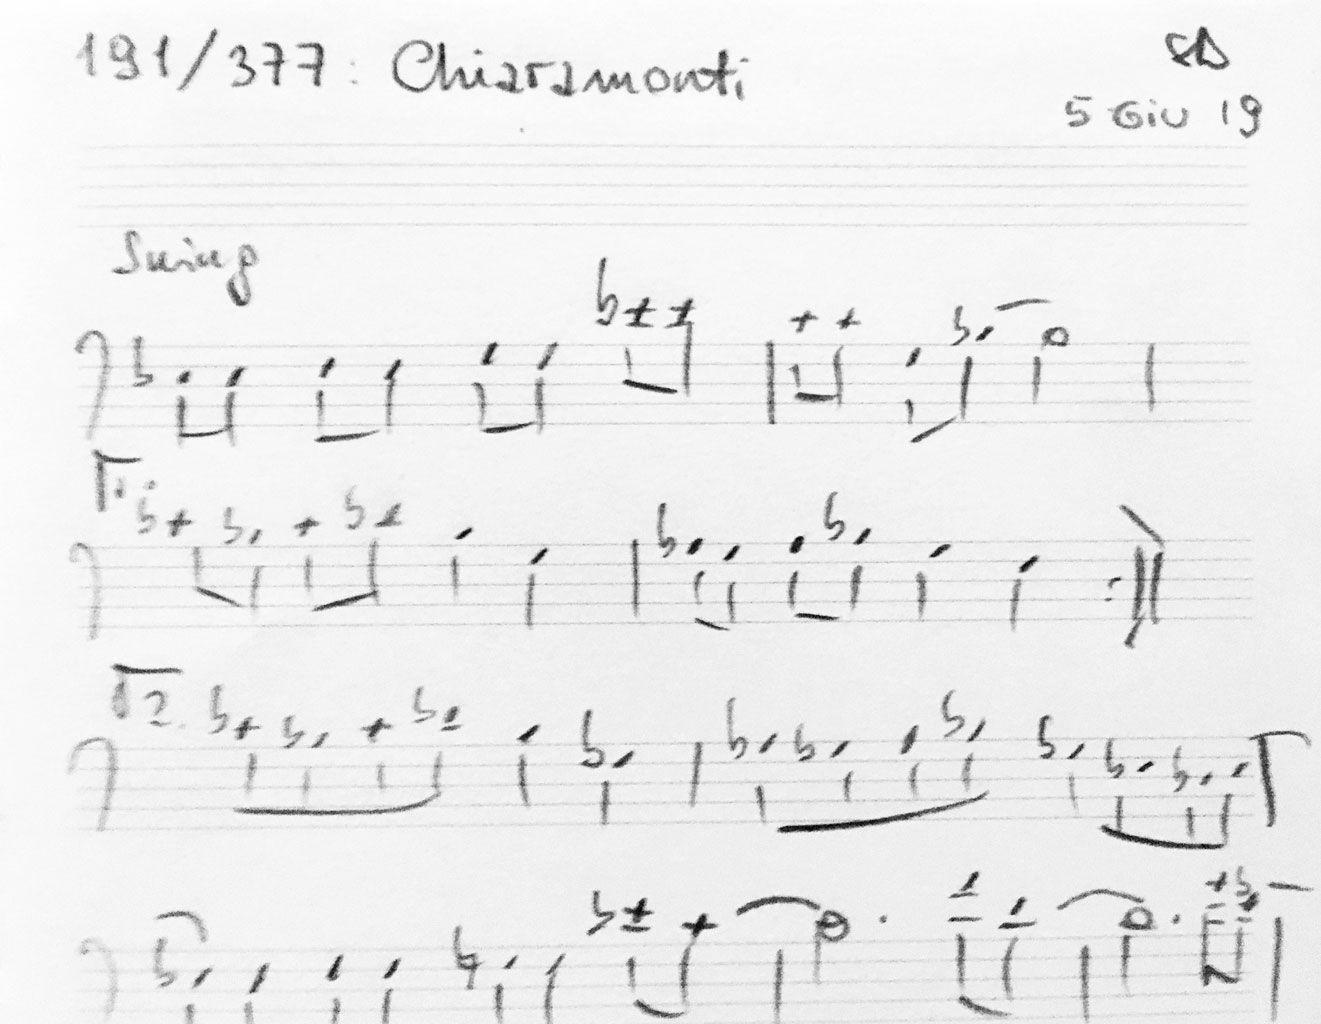 191-Chiaramonti-score